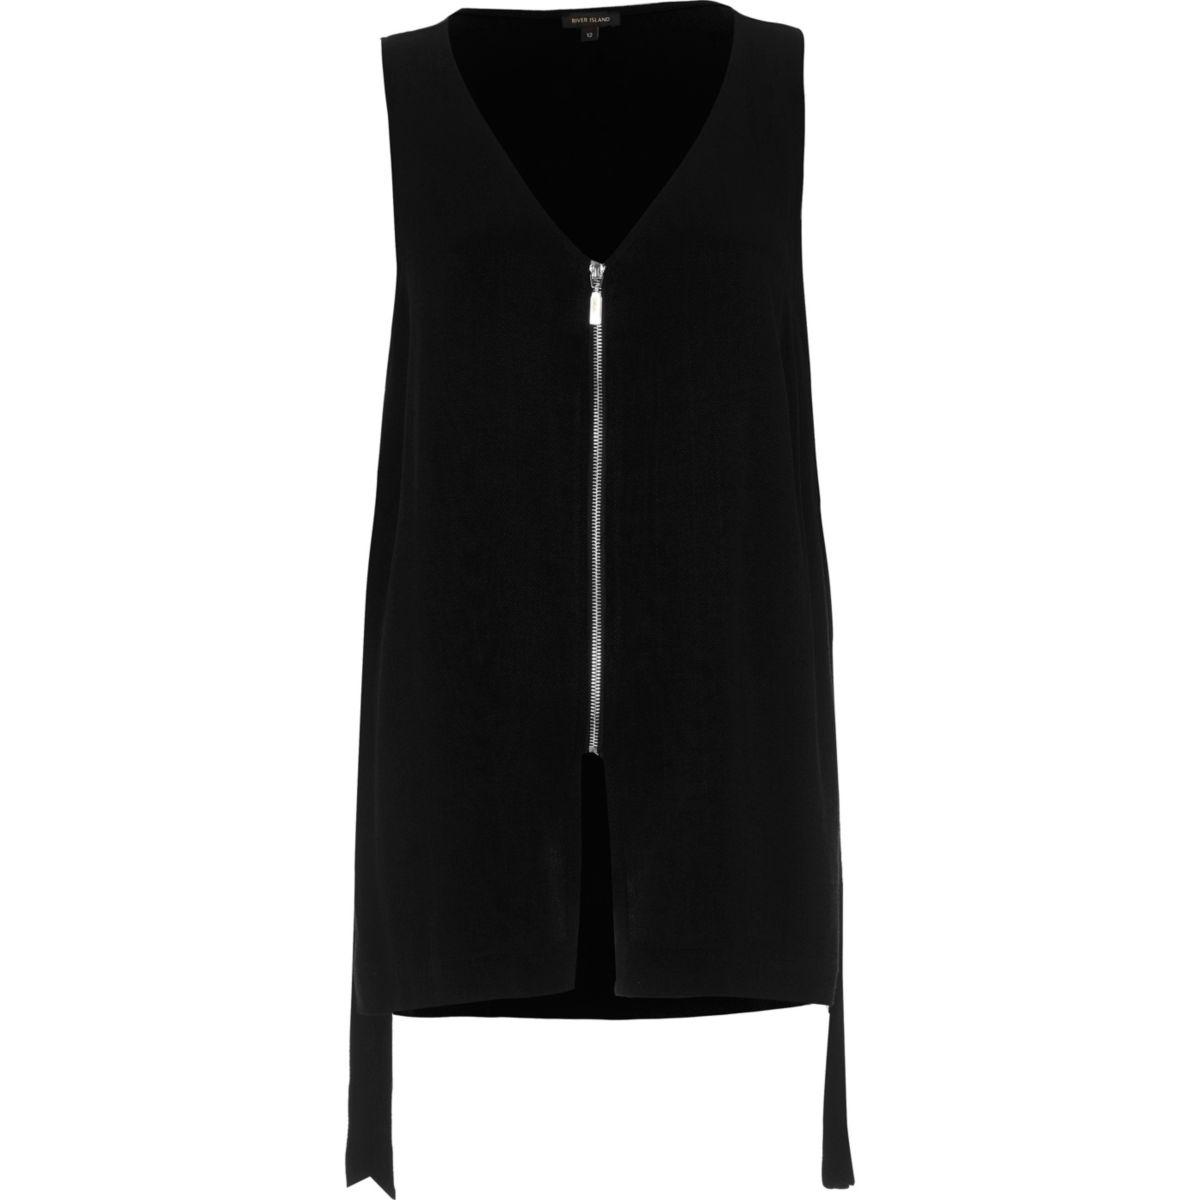 Black contrast zip sleeveless V-neck tank